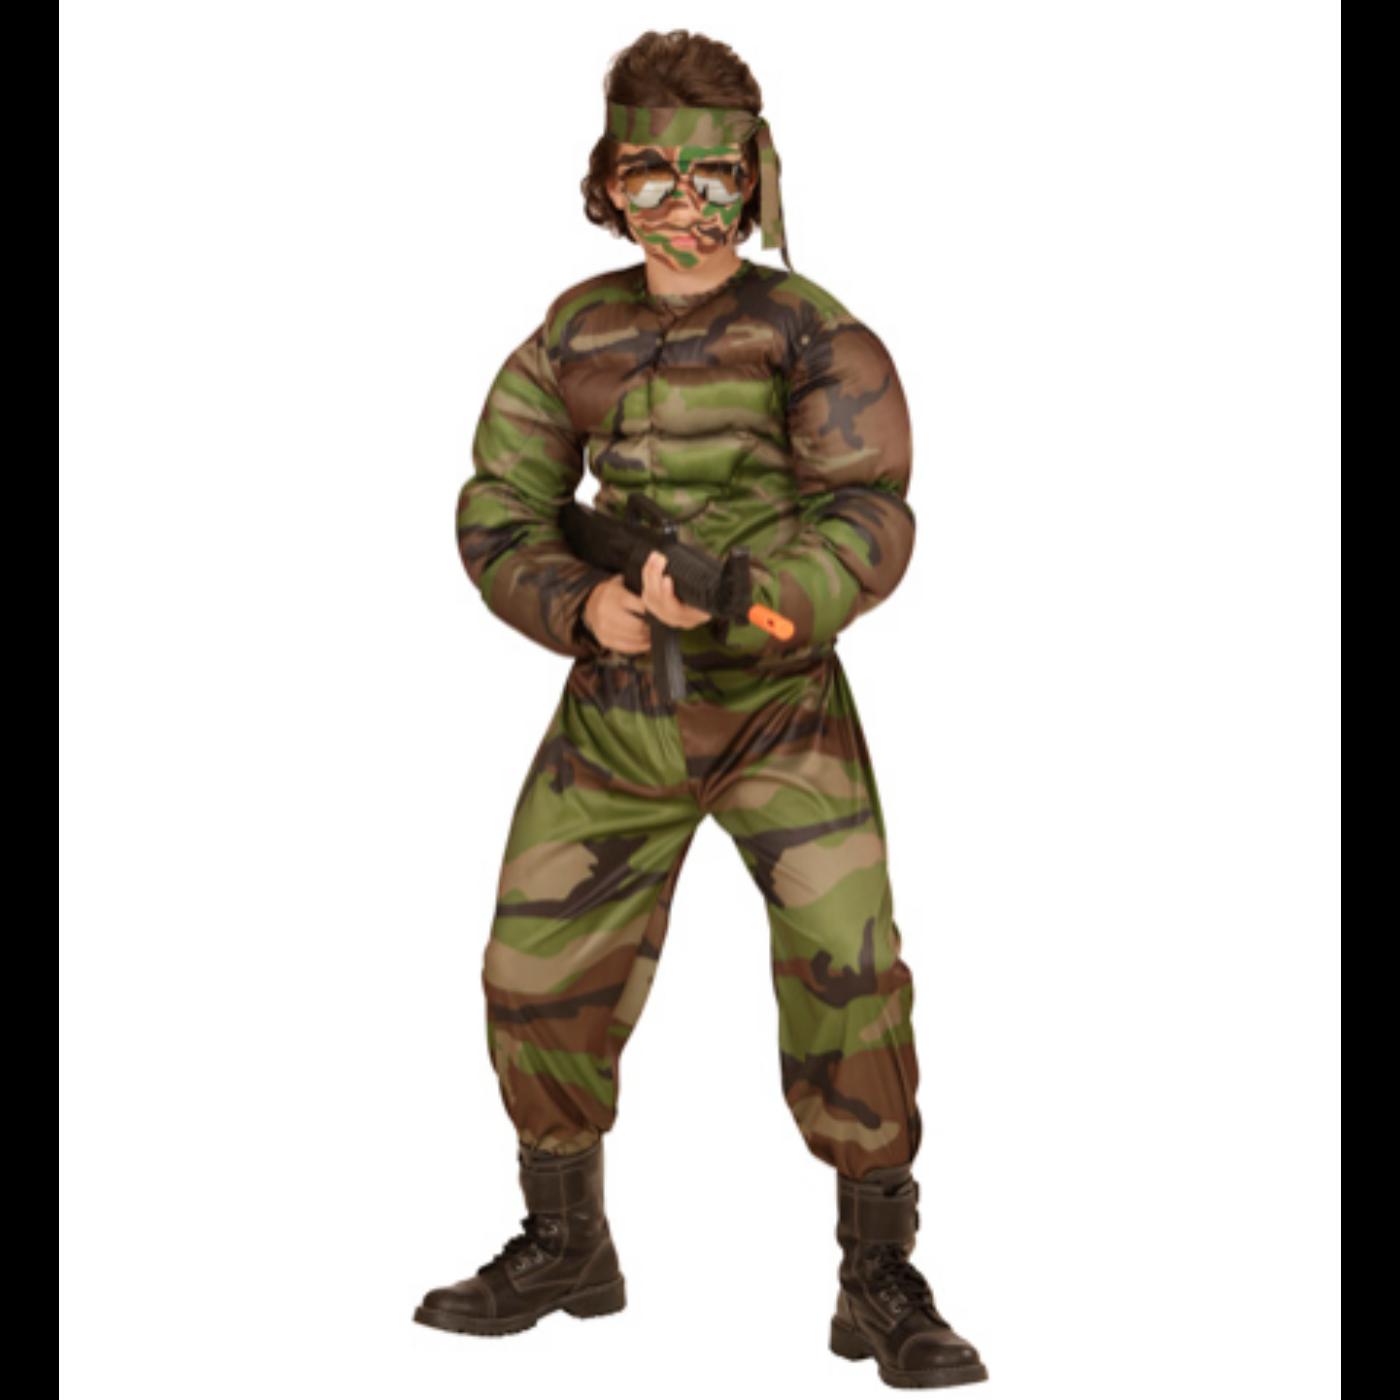 Szuper katona jelmez 158-as